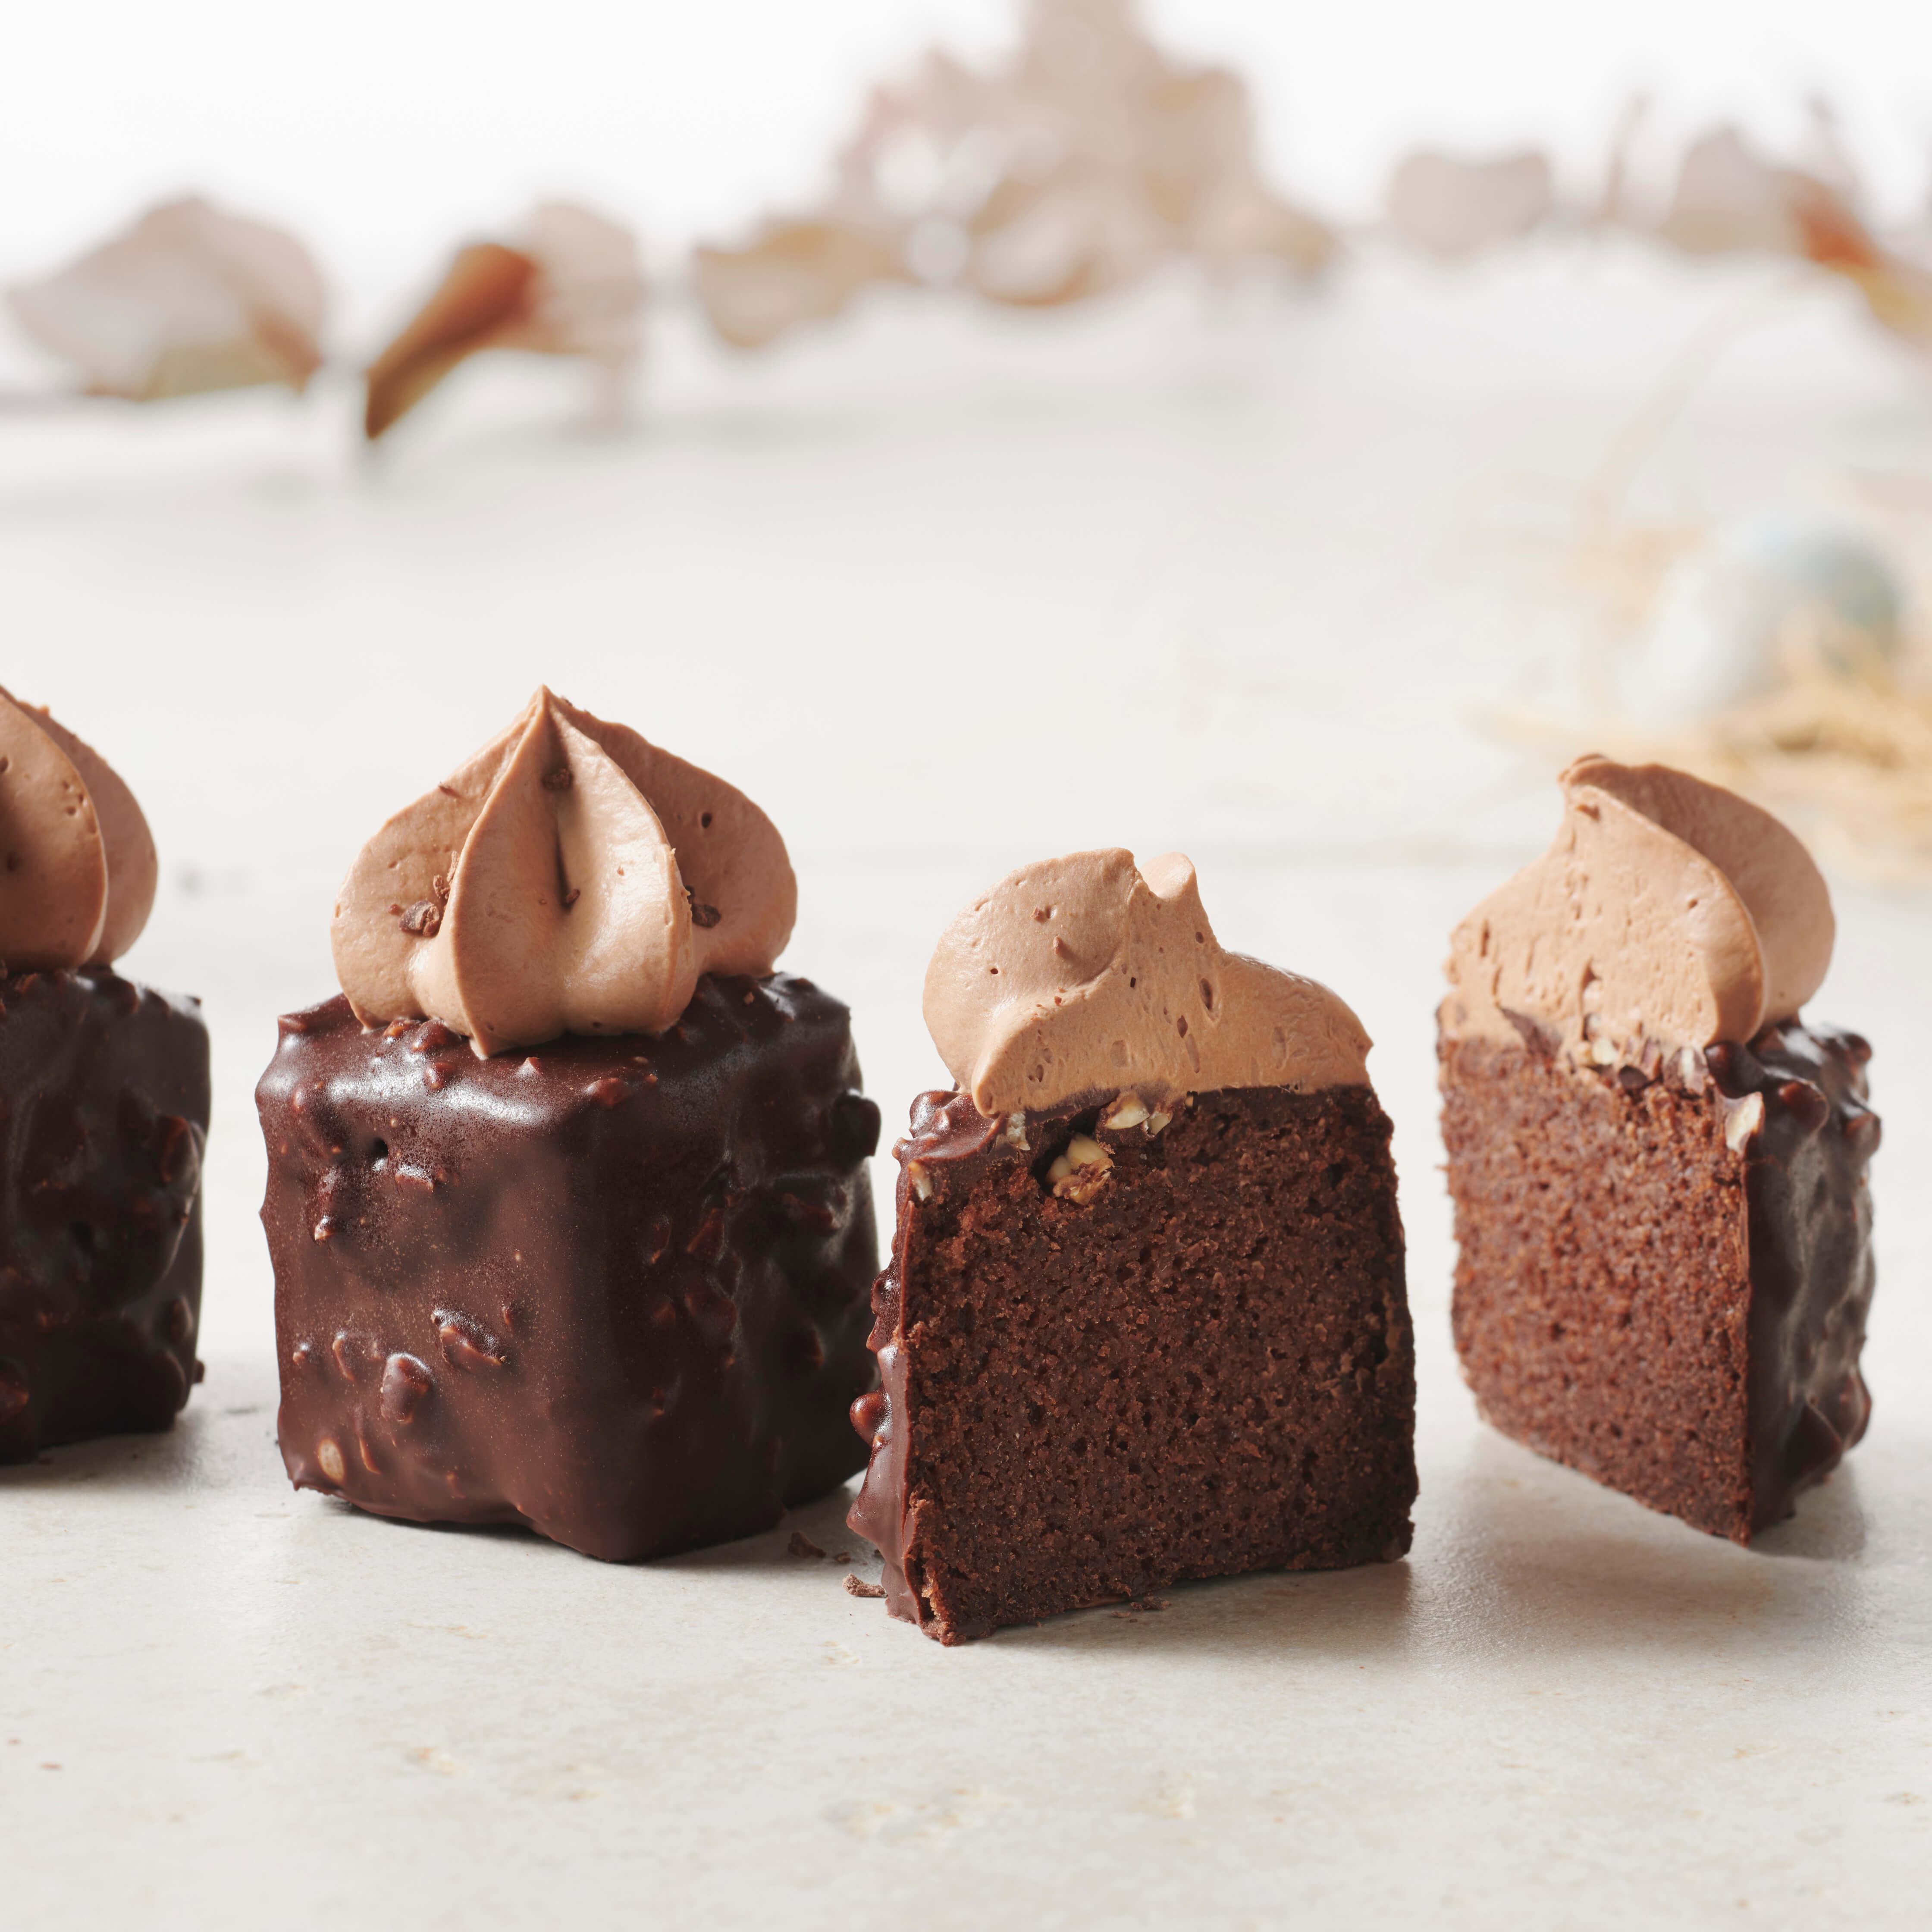 MINI GLUTEN-FREE CHOCOLATE CAKES